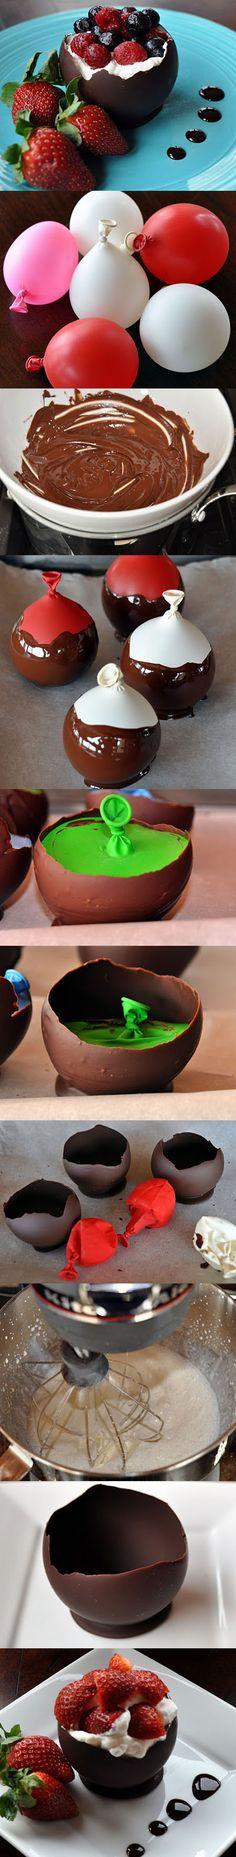 cuencos-chocolate-globos-muy-ingenioso